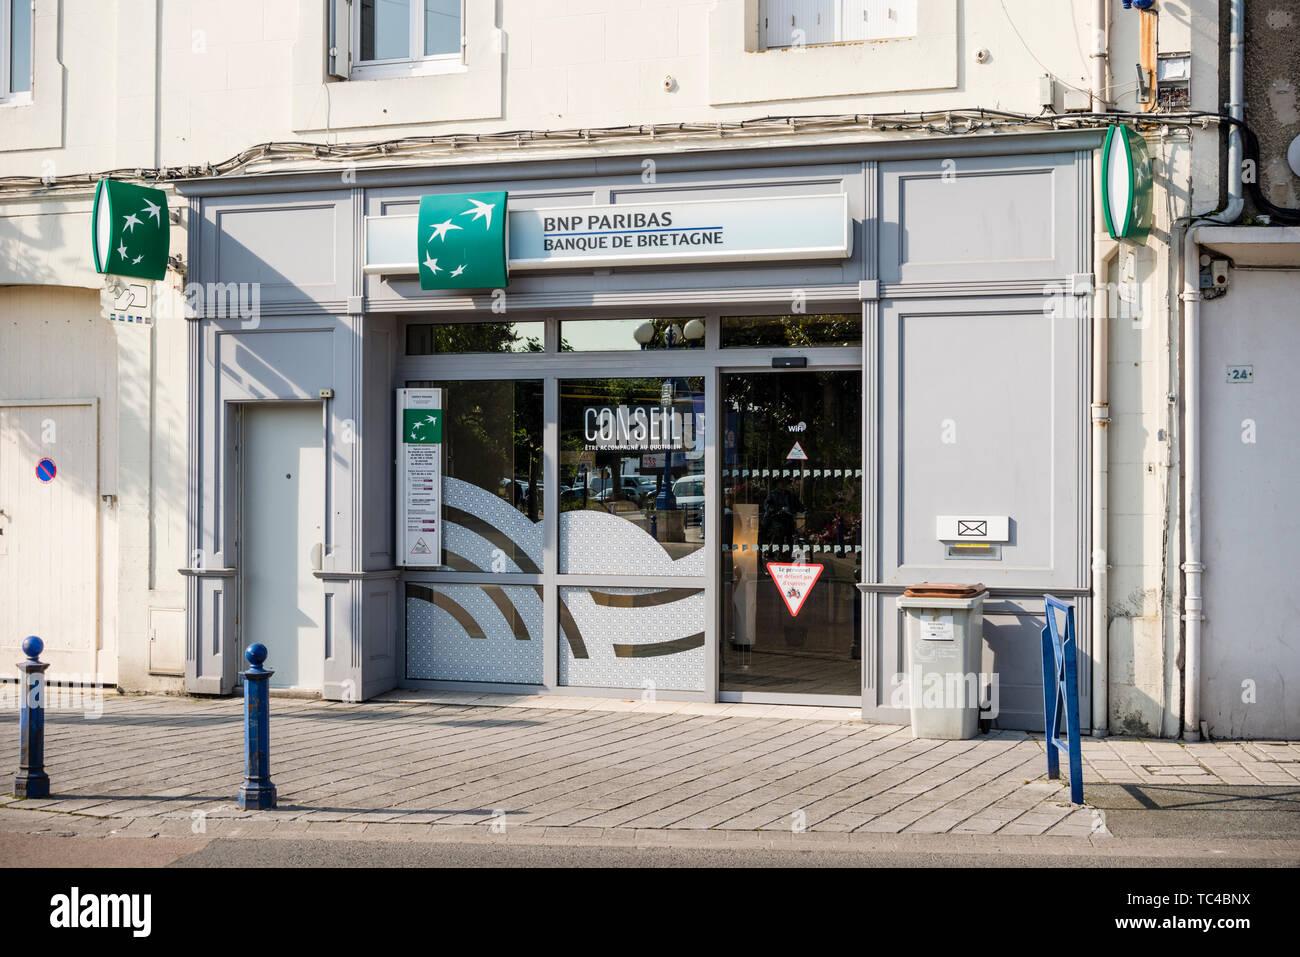 BNP Paribas branch, Saint Malo, Brittany, France - Stock Image